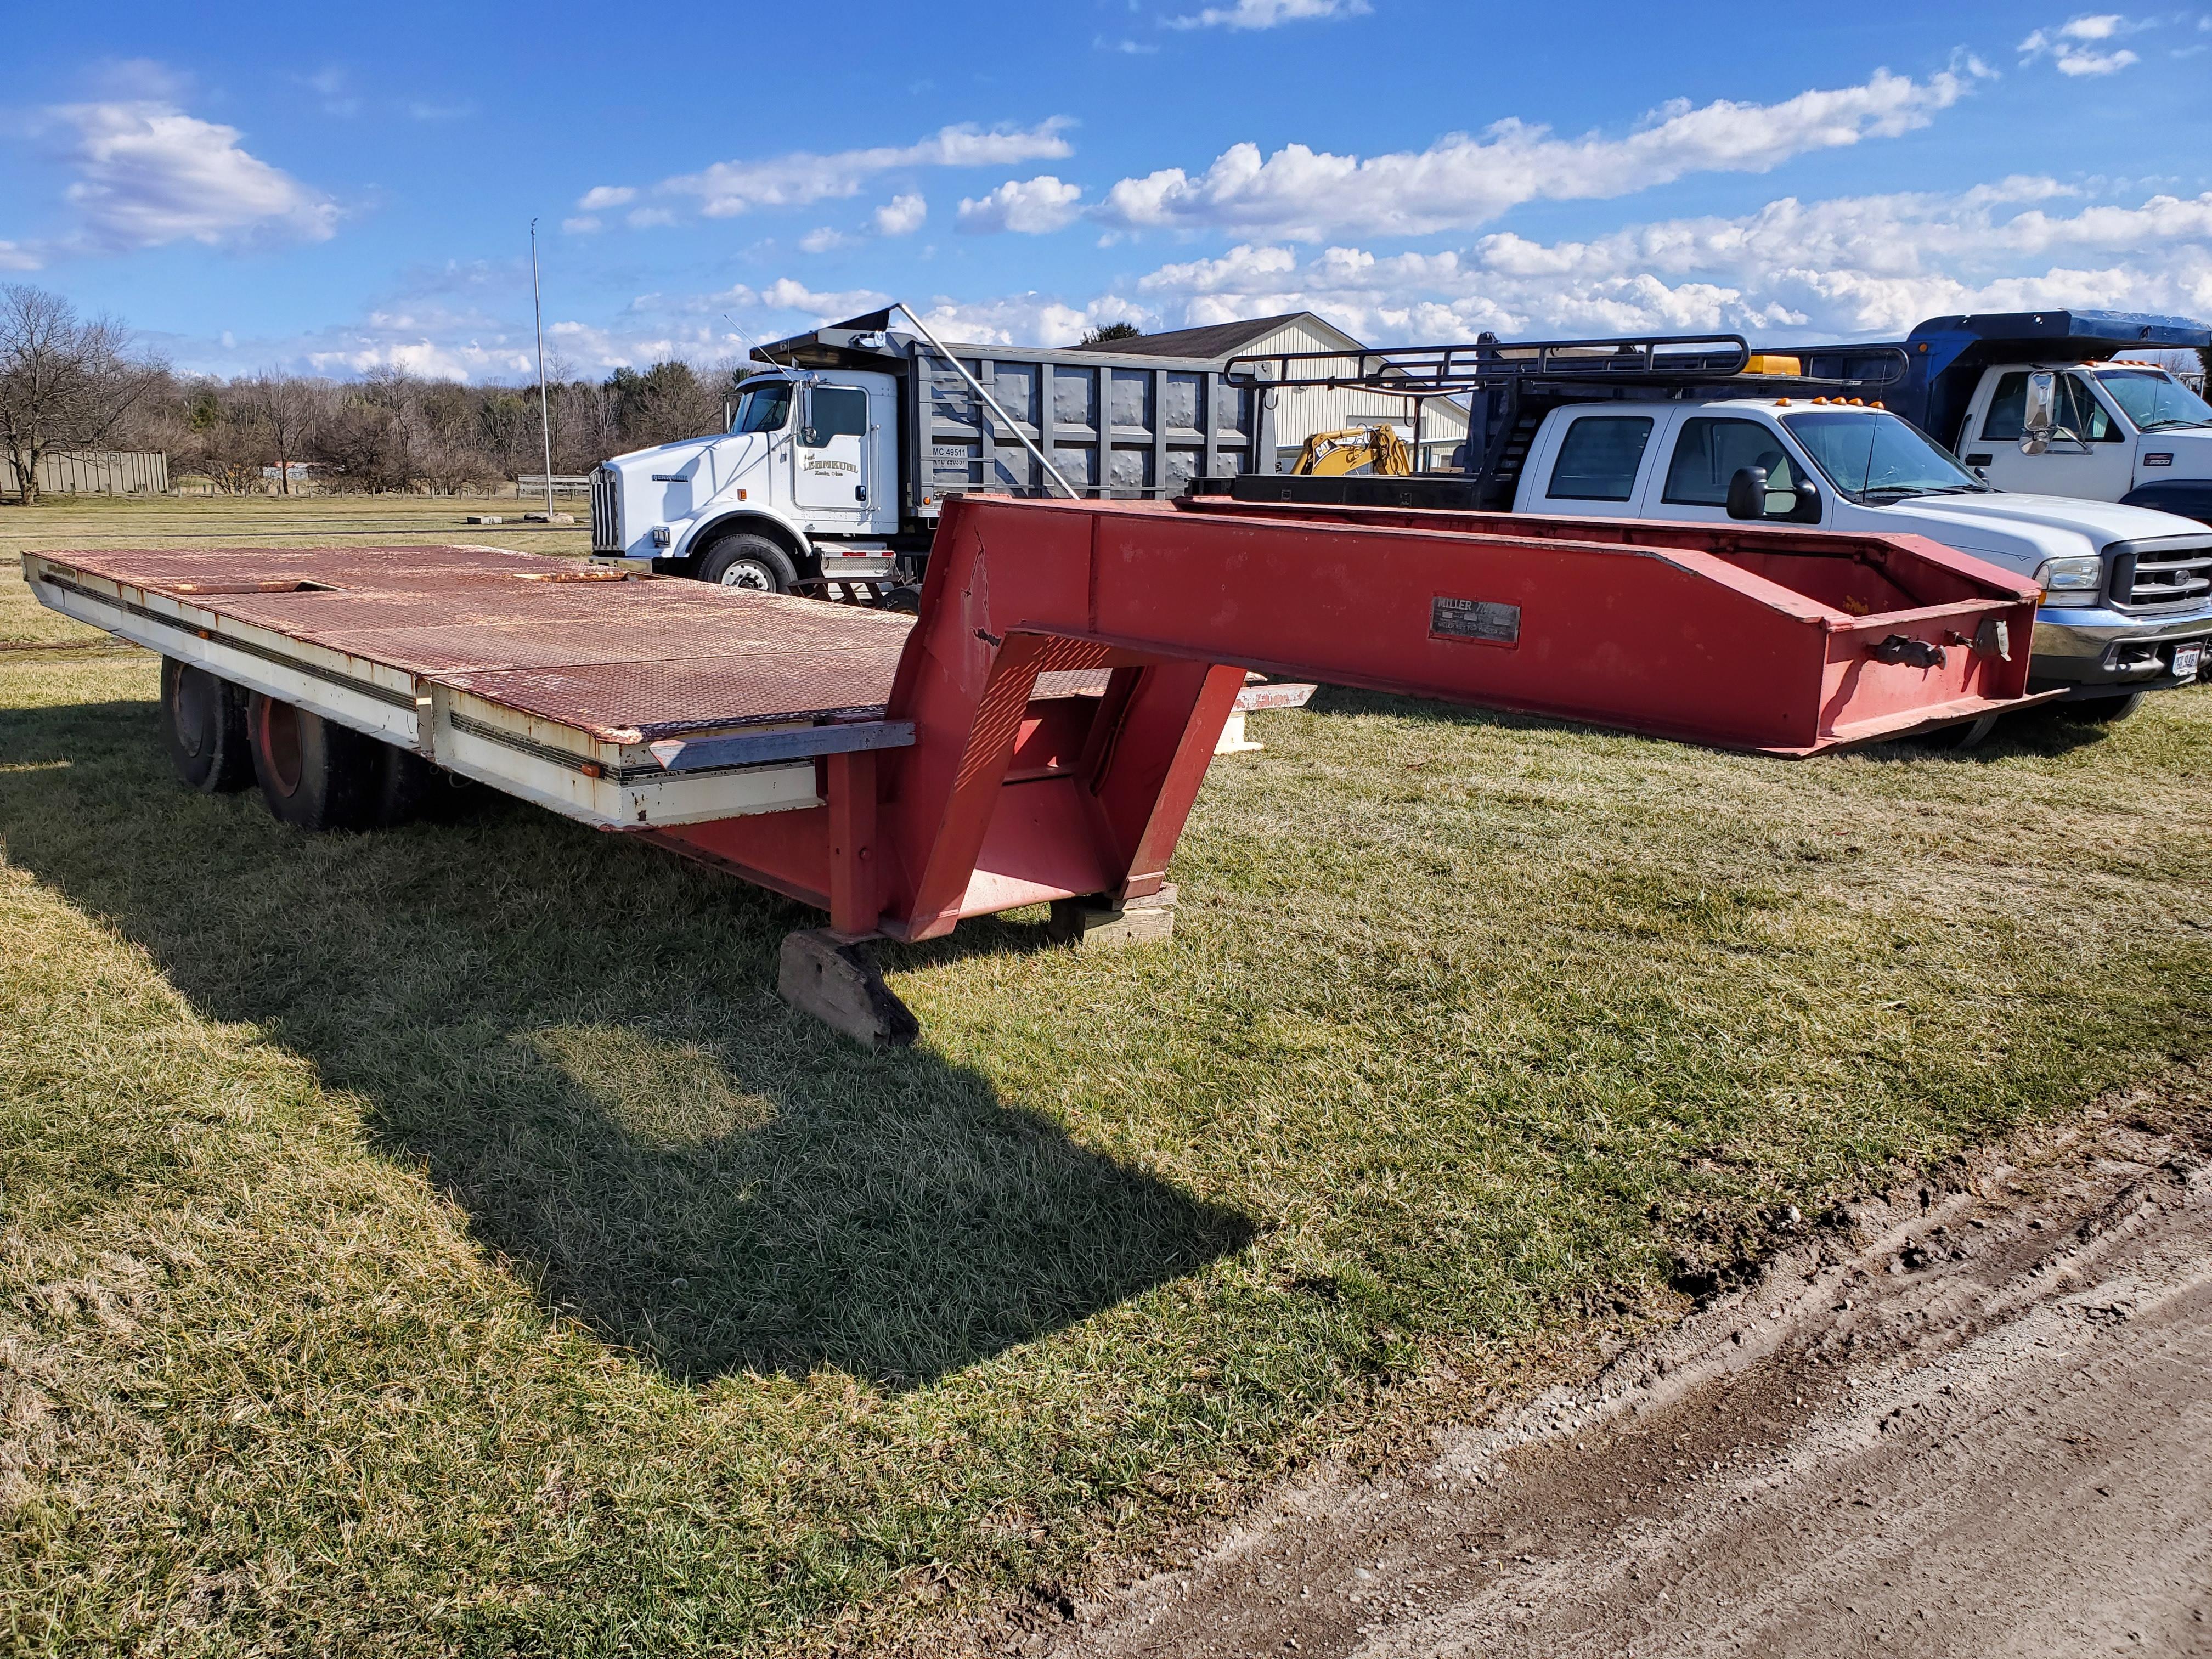 Miller Tilt Top Trailer Model OTG, s/n 8816, 22 ft. Long x 8 ft. Wide, Tandem Axle w/ Dual Wheels